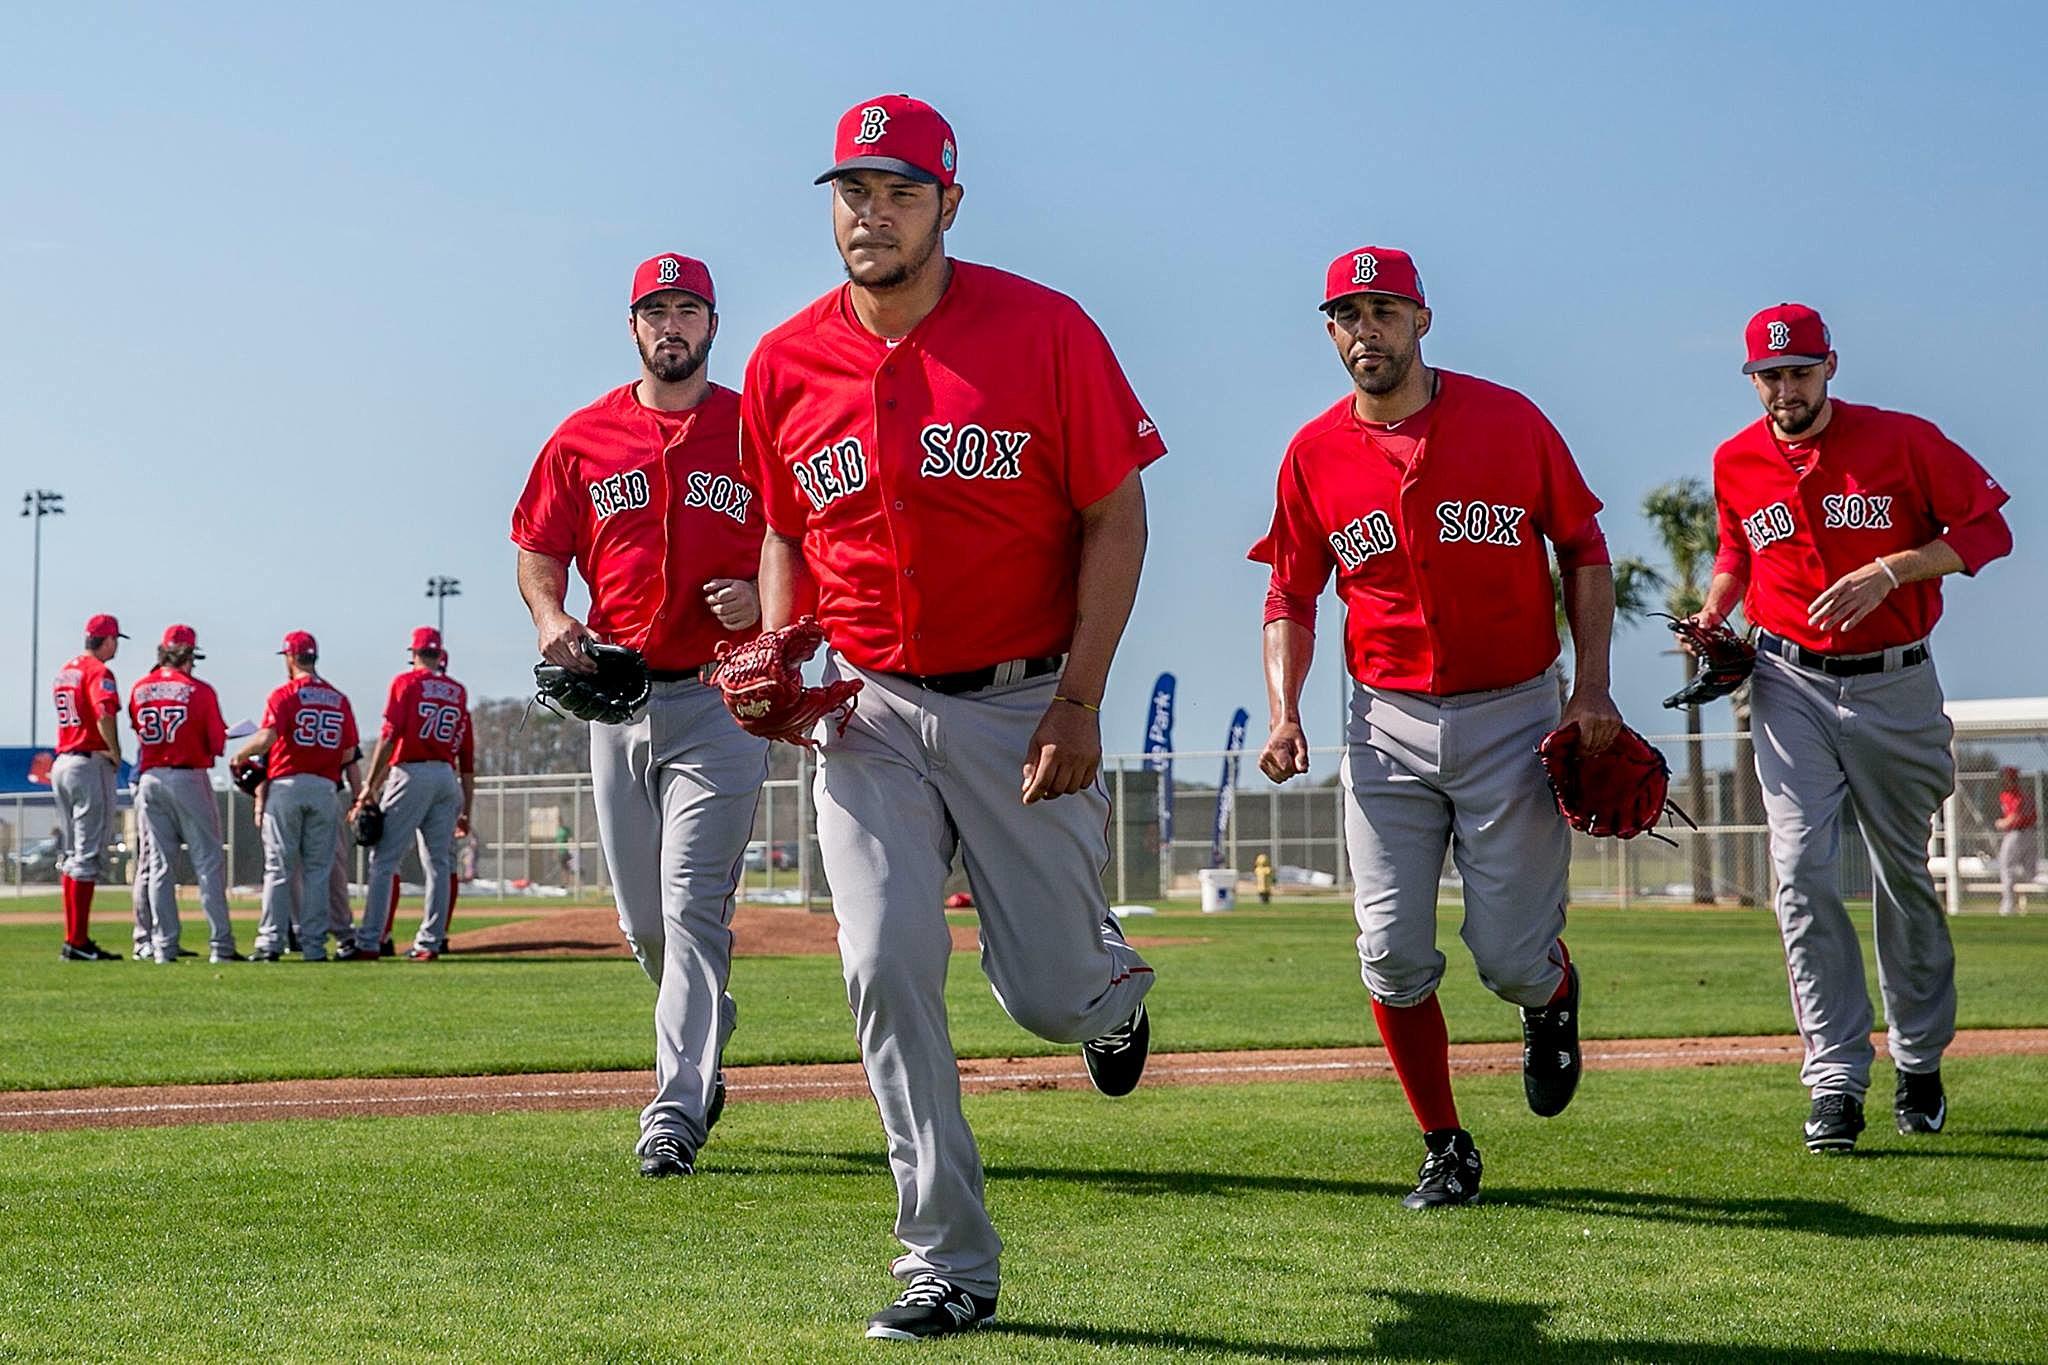 Billie Weiss/Boston Red Sox